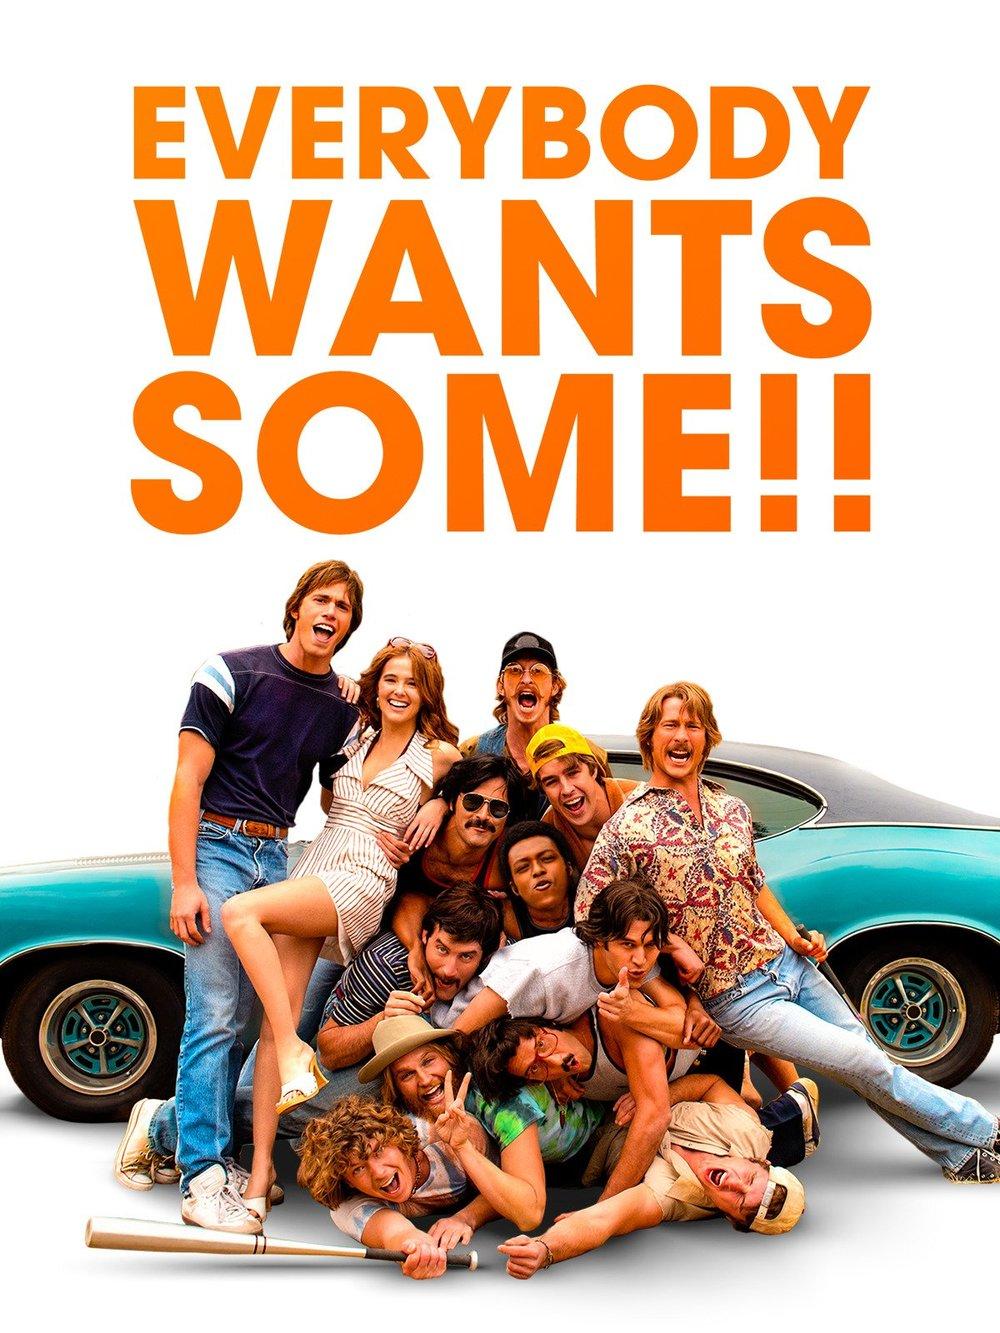 Everybody Wants Some!! (2016) - Directed by: Richard LinklaterStarring: Blake Jenner, Tyler Hoechlin, Ryan GuzmanRated: RRunning Time: 1h 57mTMM Score: 4 StarsSTRENGTHS: Nostalgia, Music, CharactersWEAKNESSES: Very Slightly Too Long